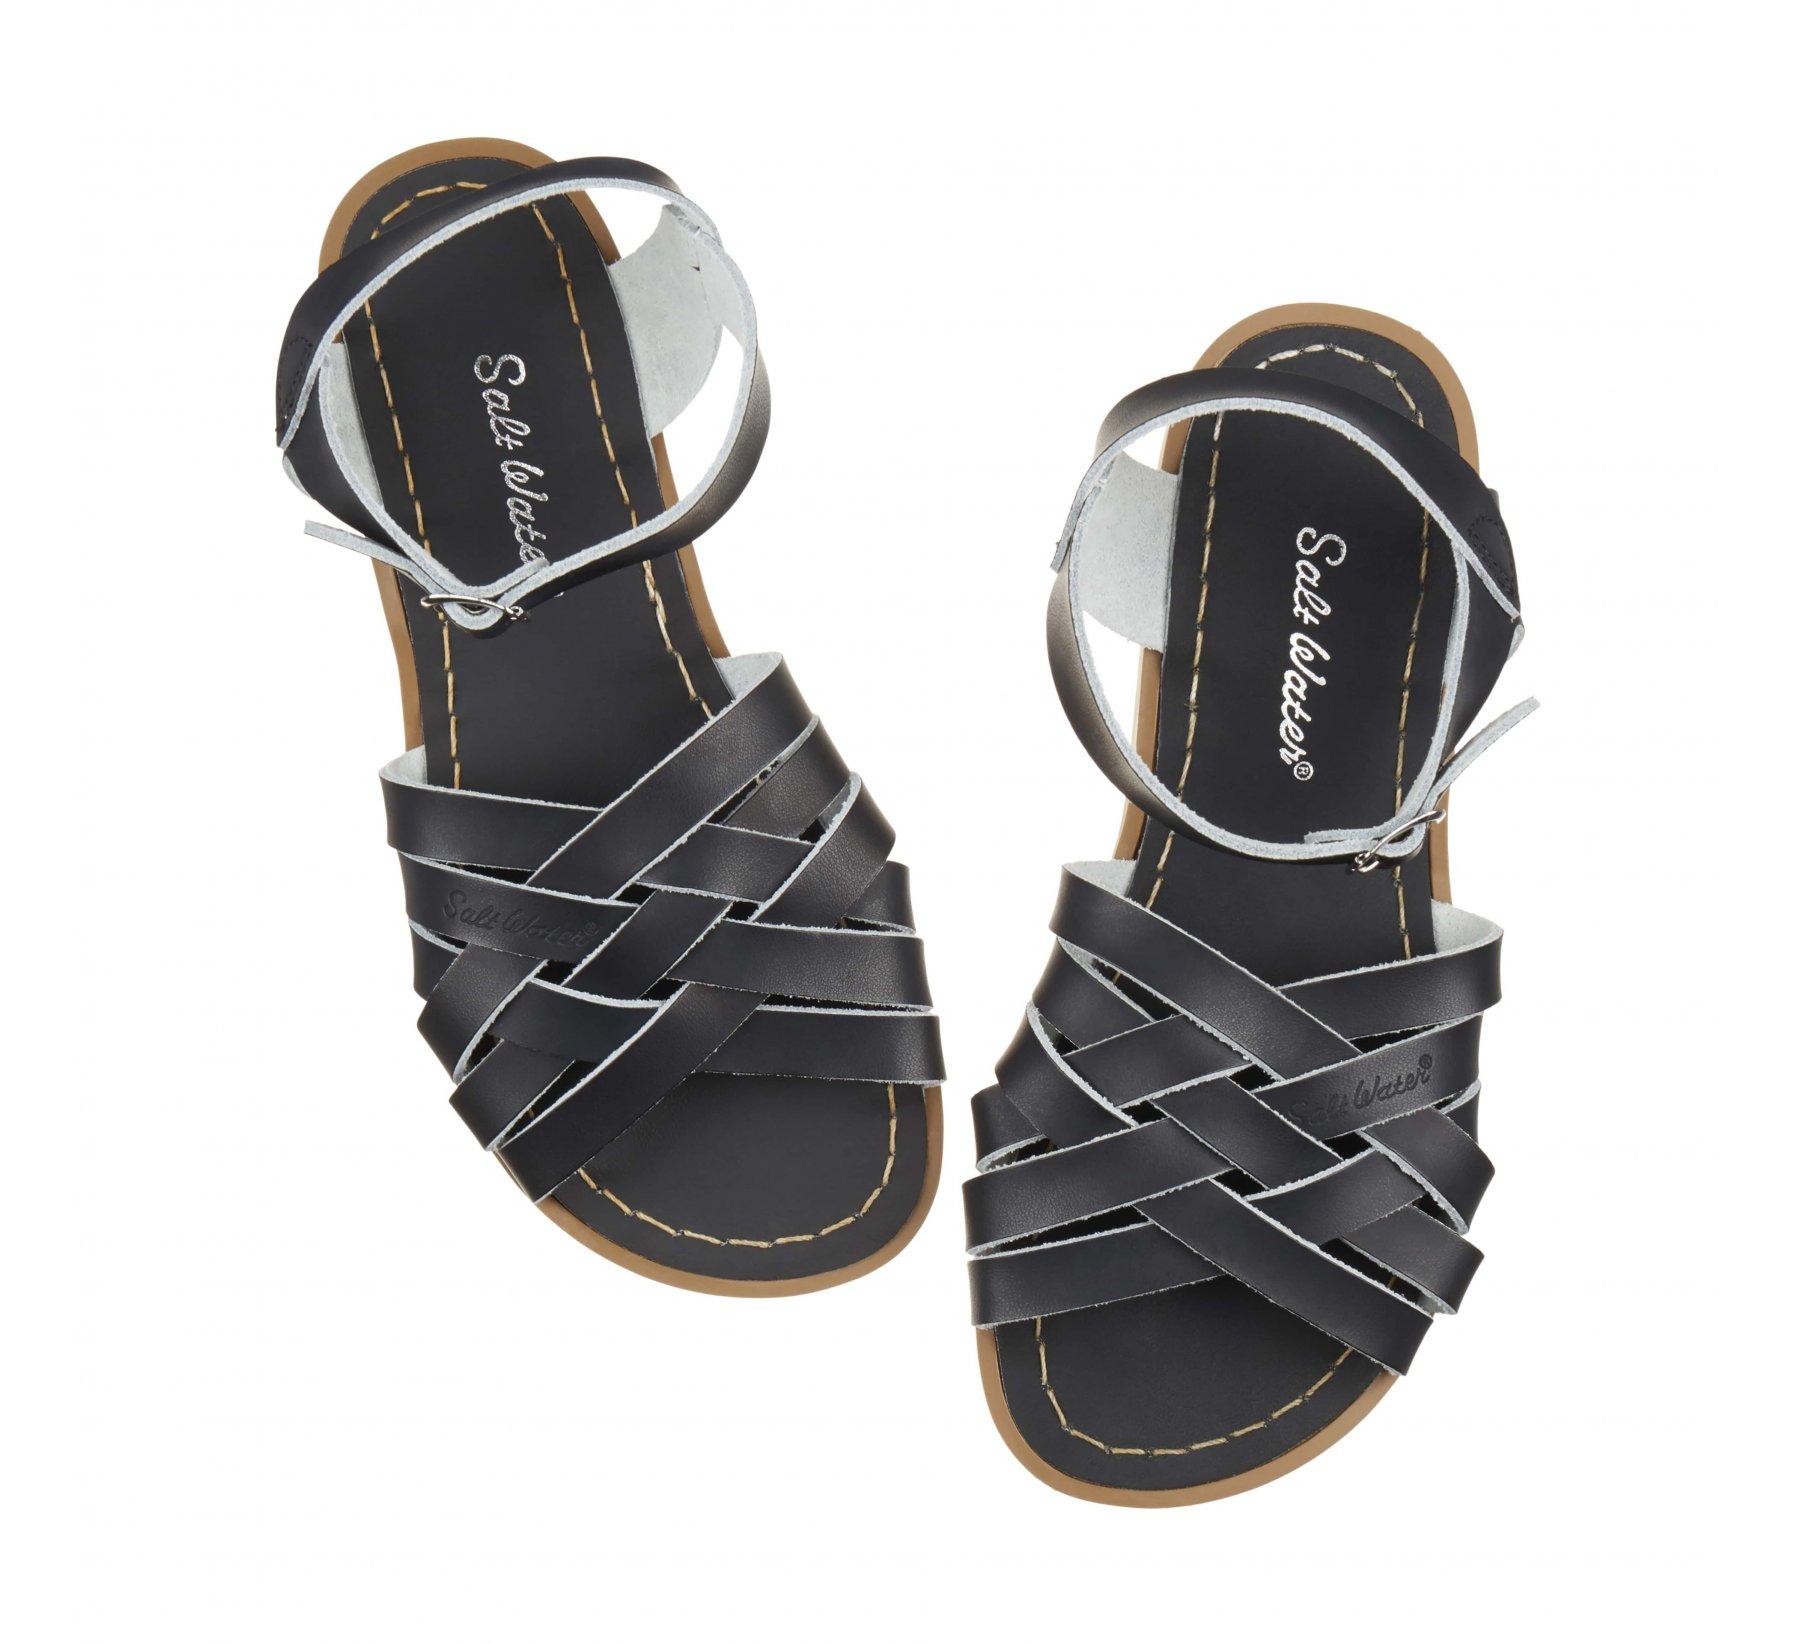 Retro Black  - Salt Water Sandals